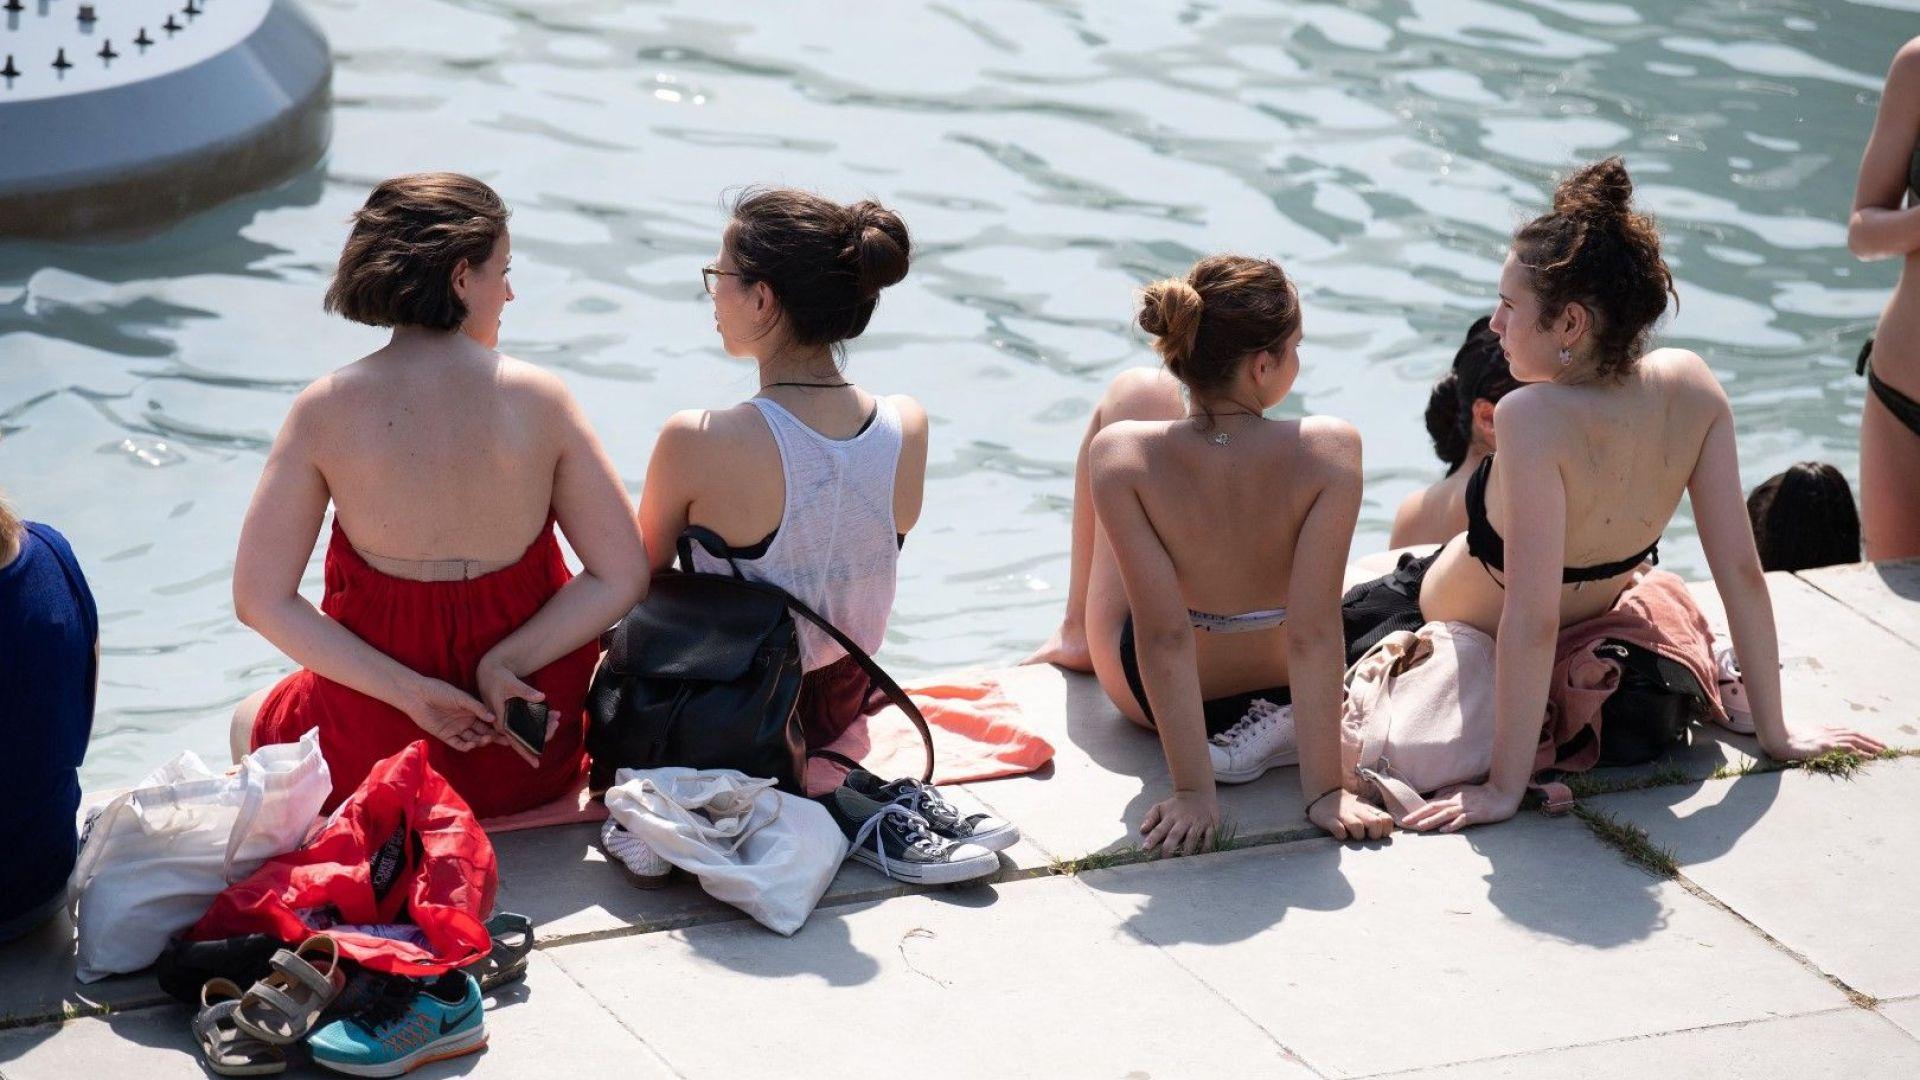 Рекордно високи температури, термометрите във Франция регистрираха 41,9 градуса по Целзий